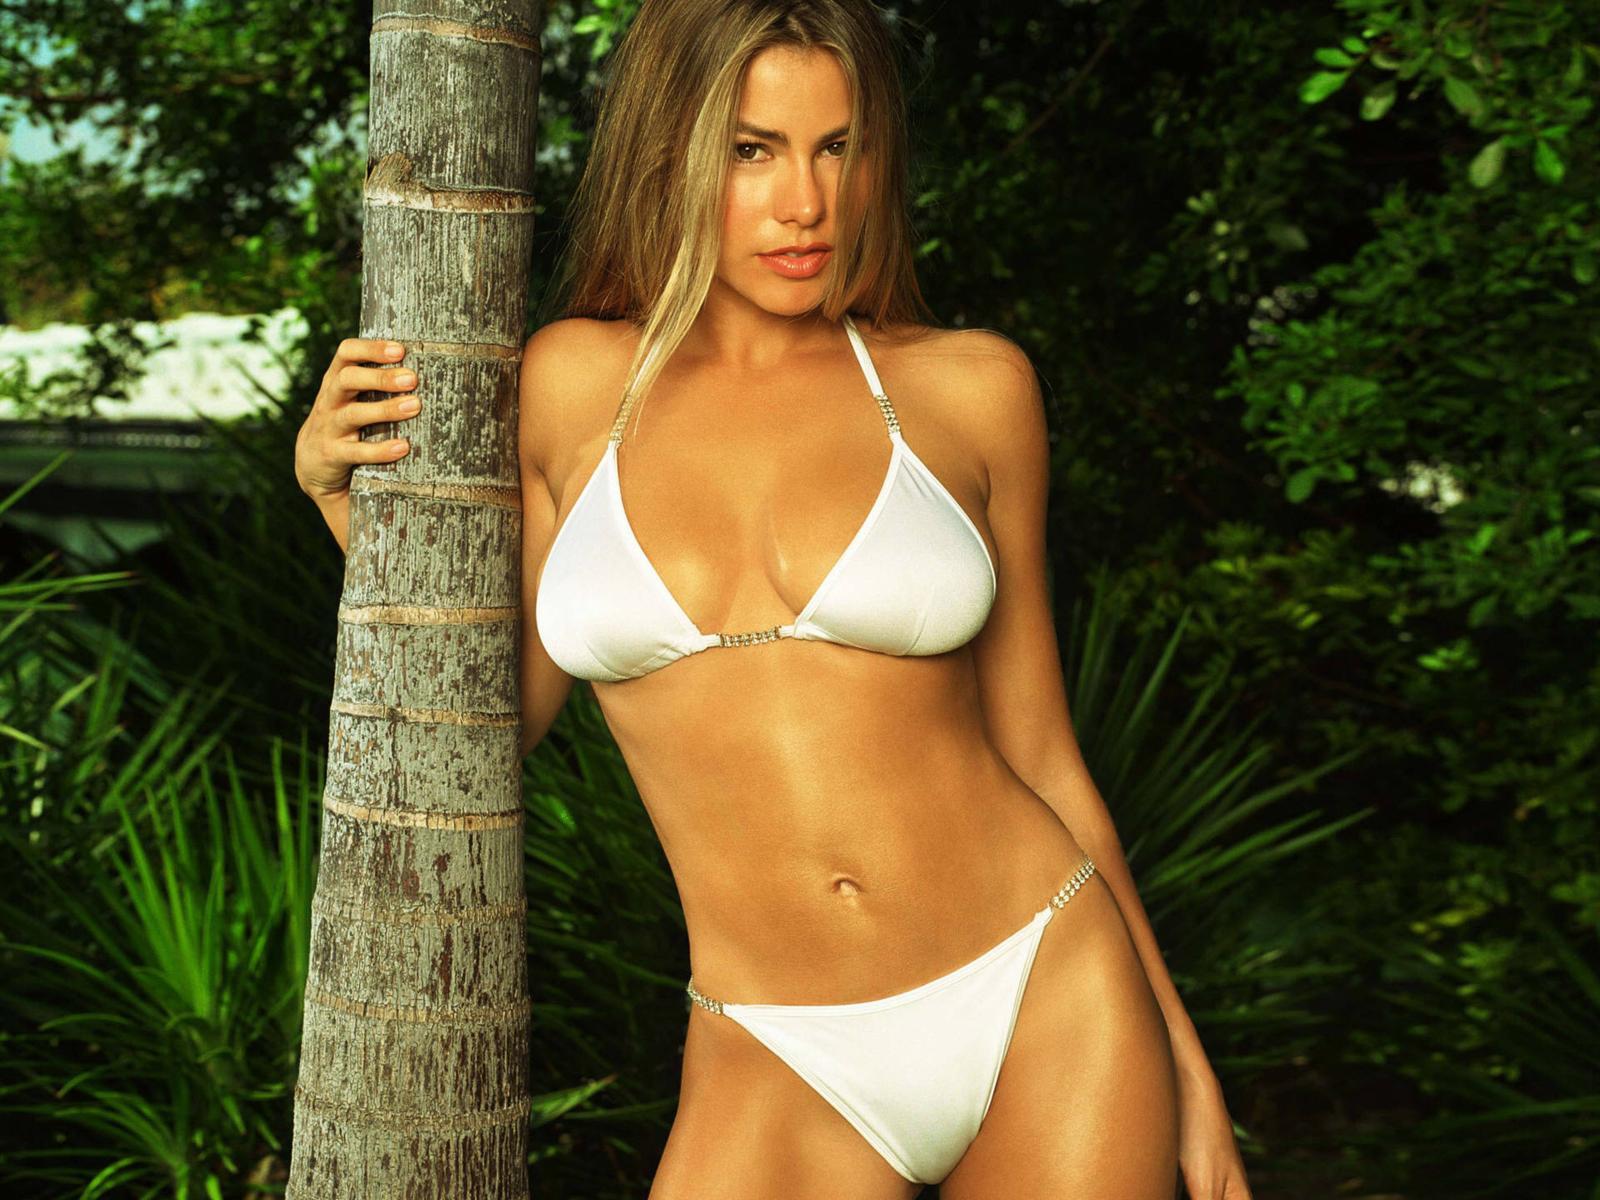 Bree olson bikini